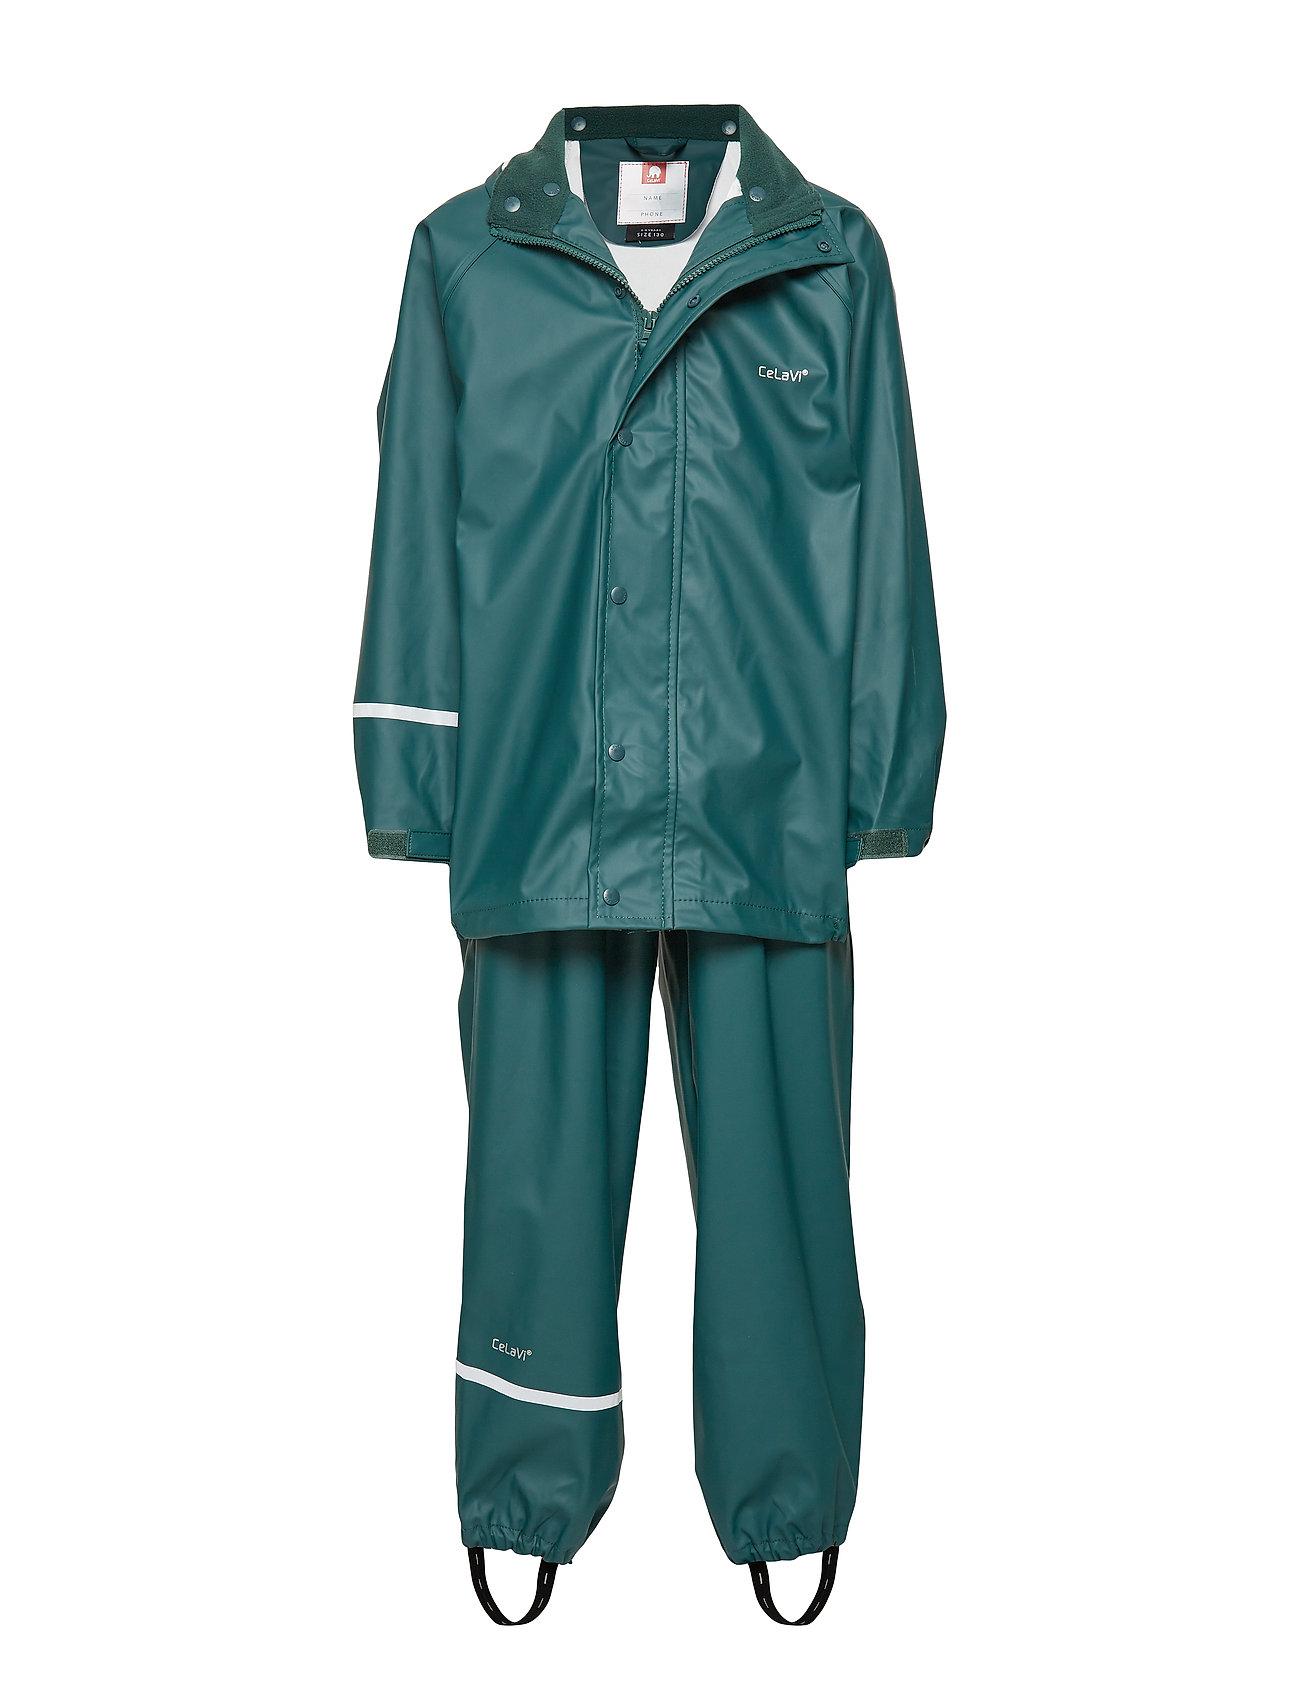 CeLaVi Basci rainwear set, solid